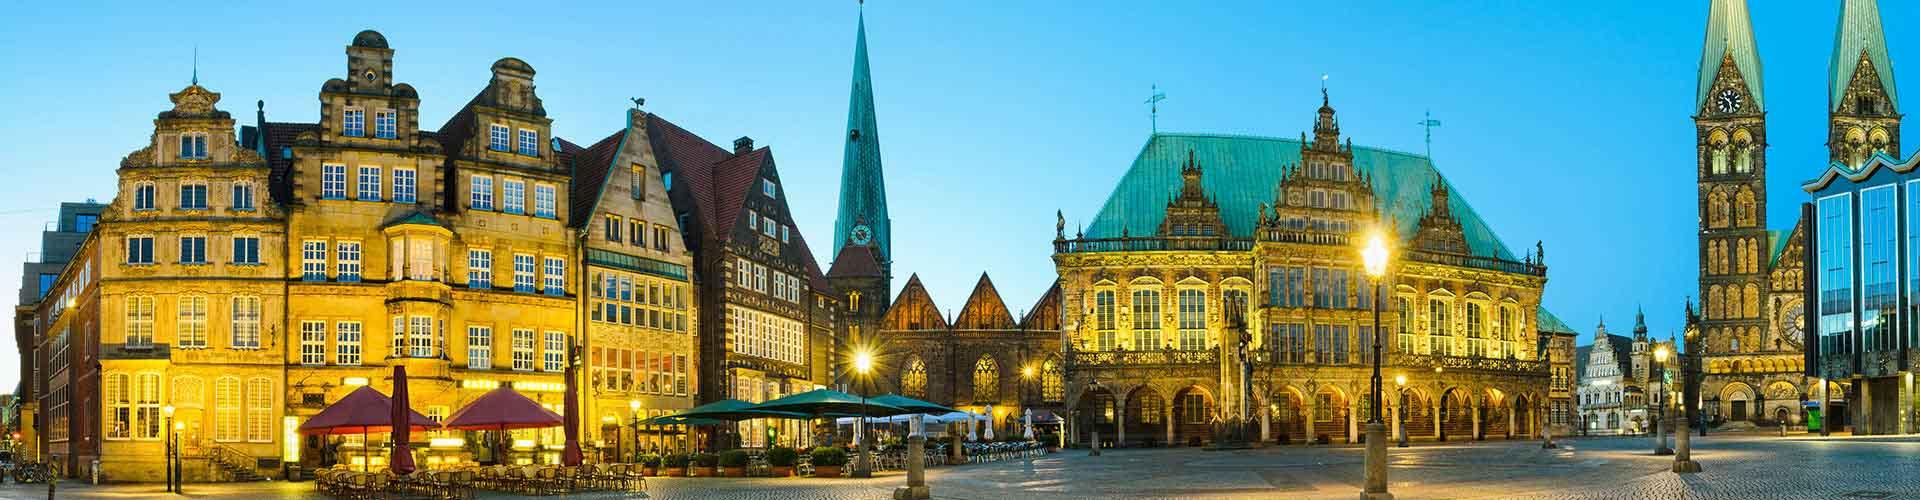 Bremen – Retkeily kaupungiosassa Östliche Vorstadt. Bremen -karttoja, valokuvia ja arvosteluja kaikista Bremen -retkeilyalueista.